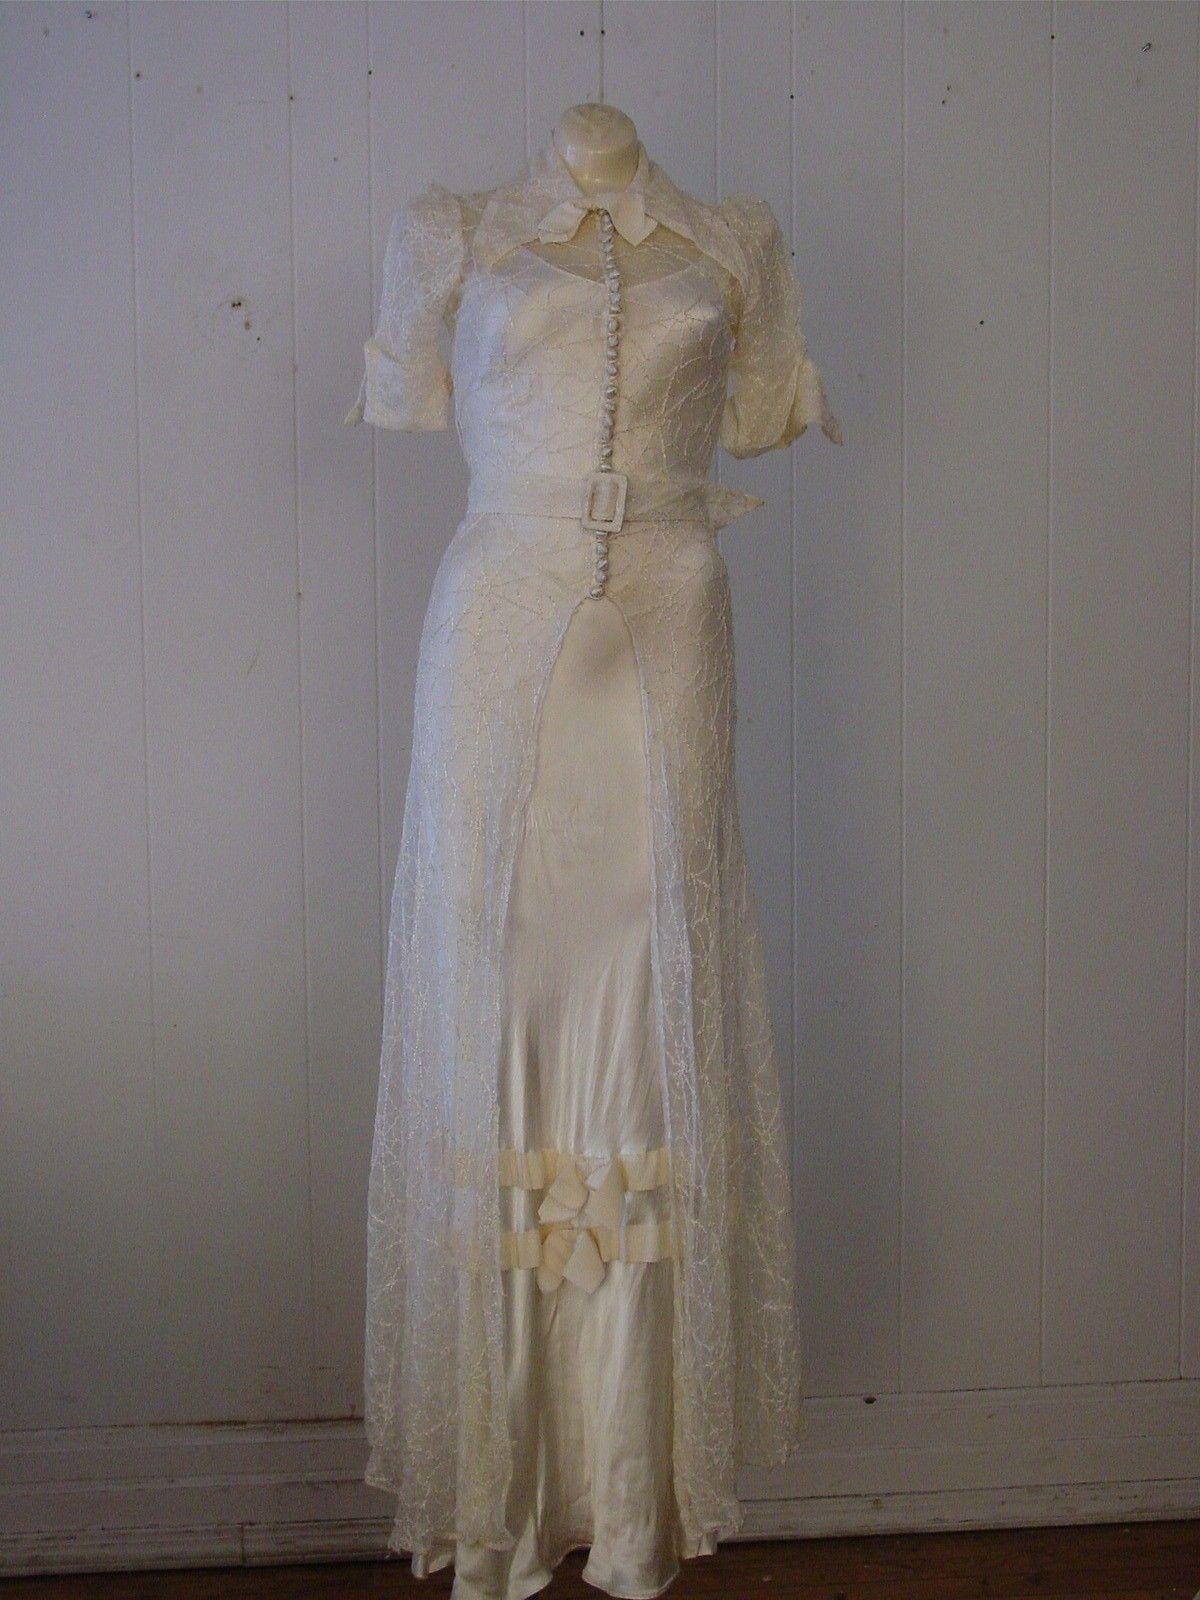 Vintage 1920s 30s Spider Web Dress Wedding Formal Gown Small   eBay ...